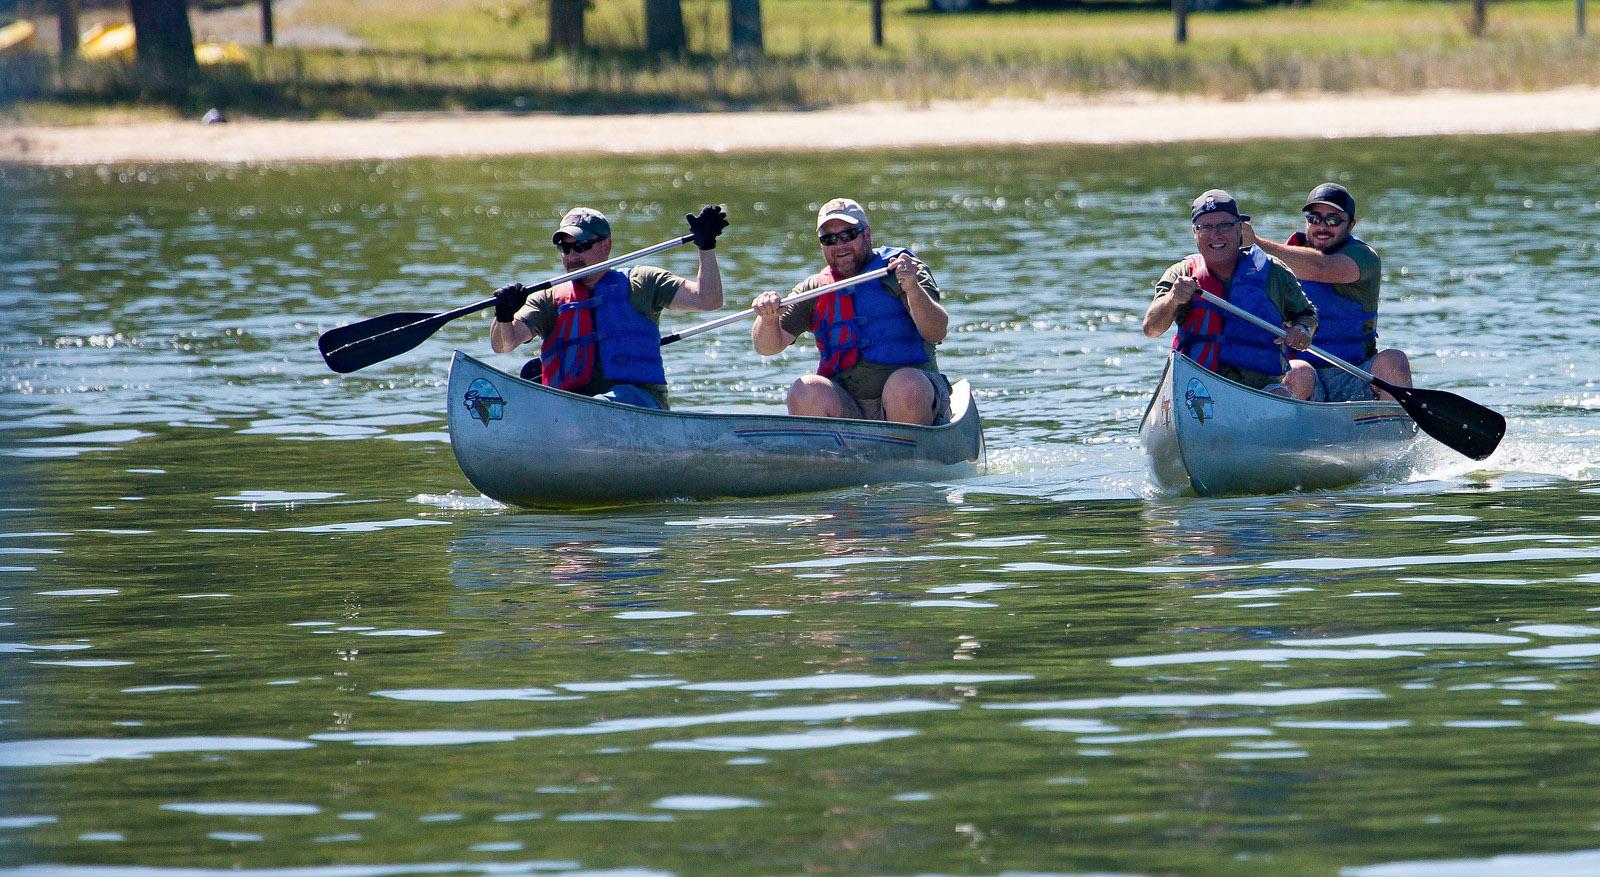 Canoe+(6).jpg